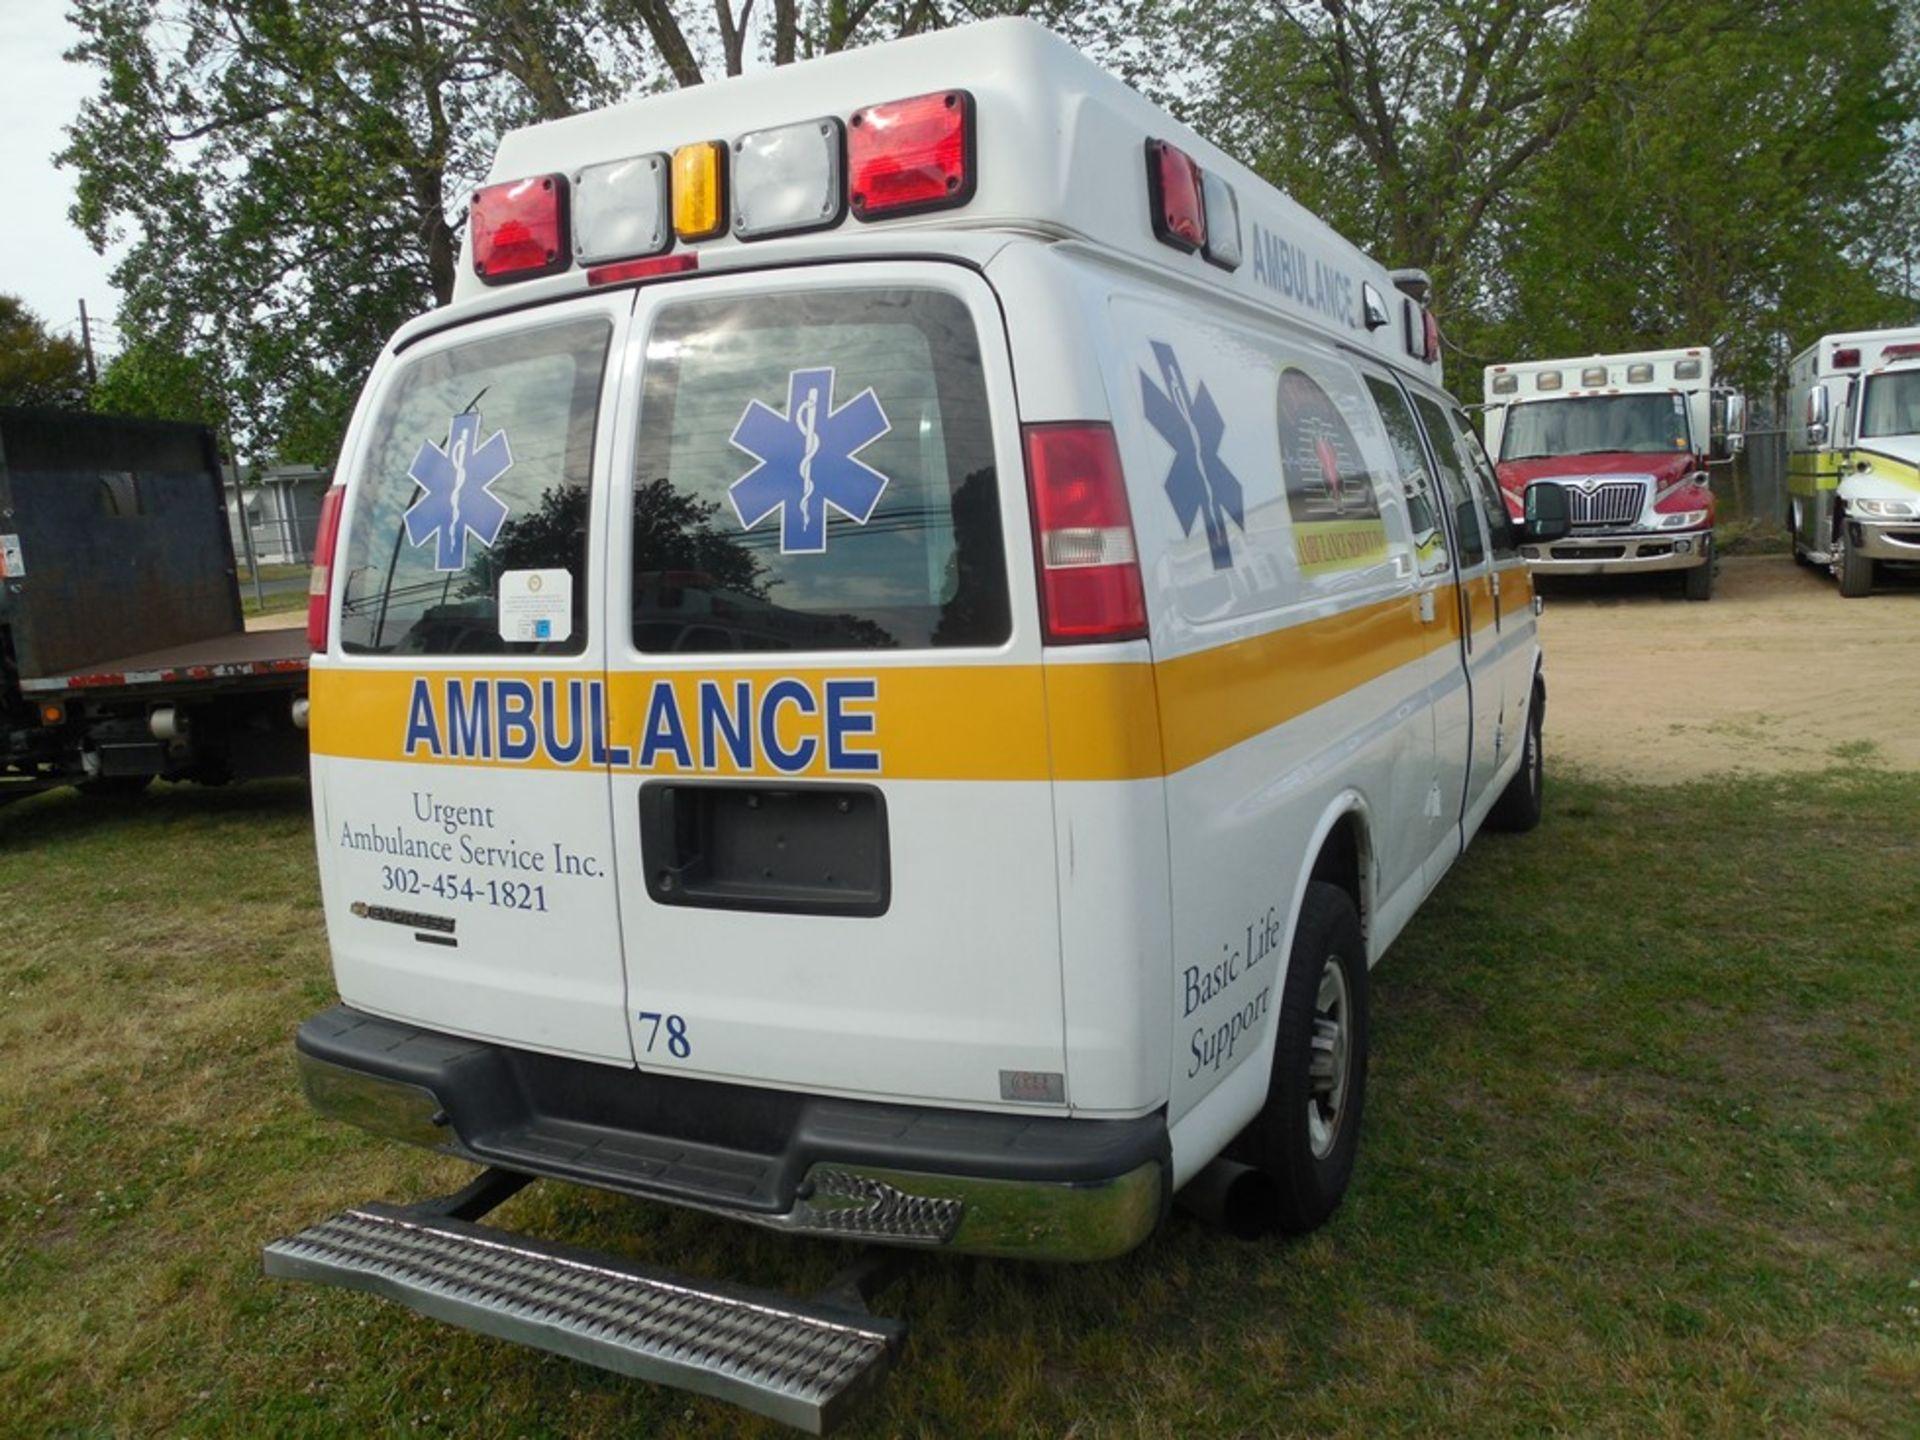 2014 Chev van ambulance dsl, 172,472 miles, vin# 1GBZGUC19E1162022 - Image 4 of 6